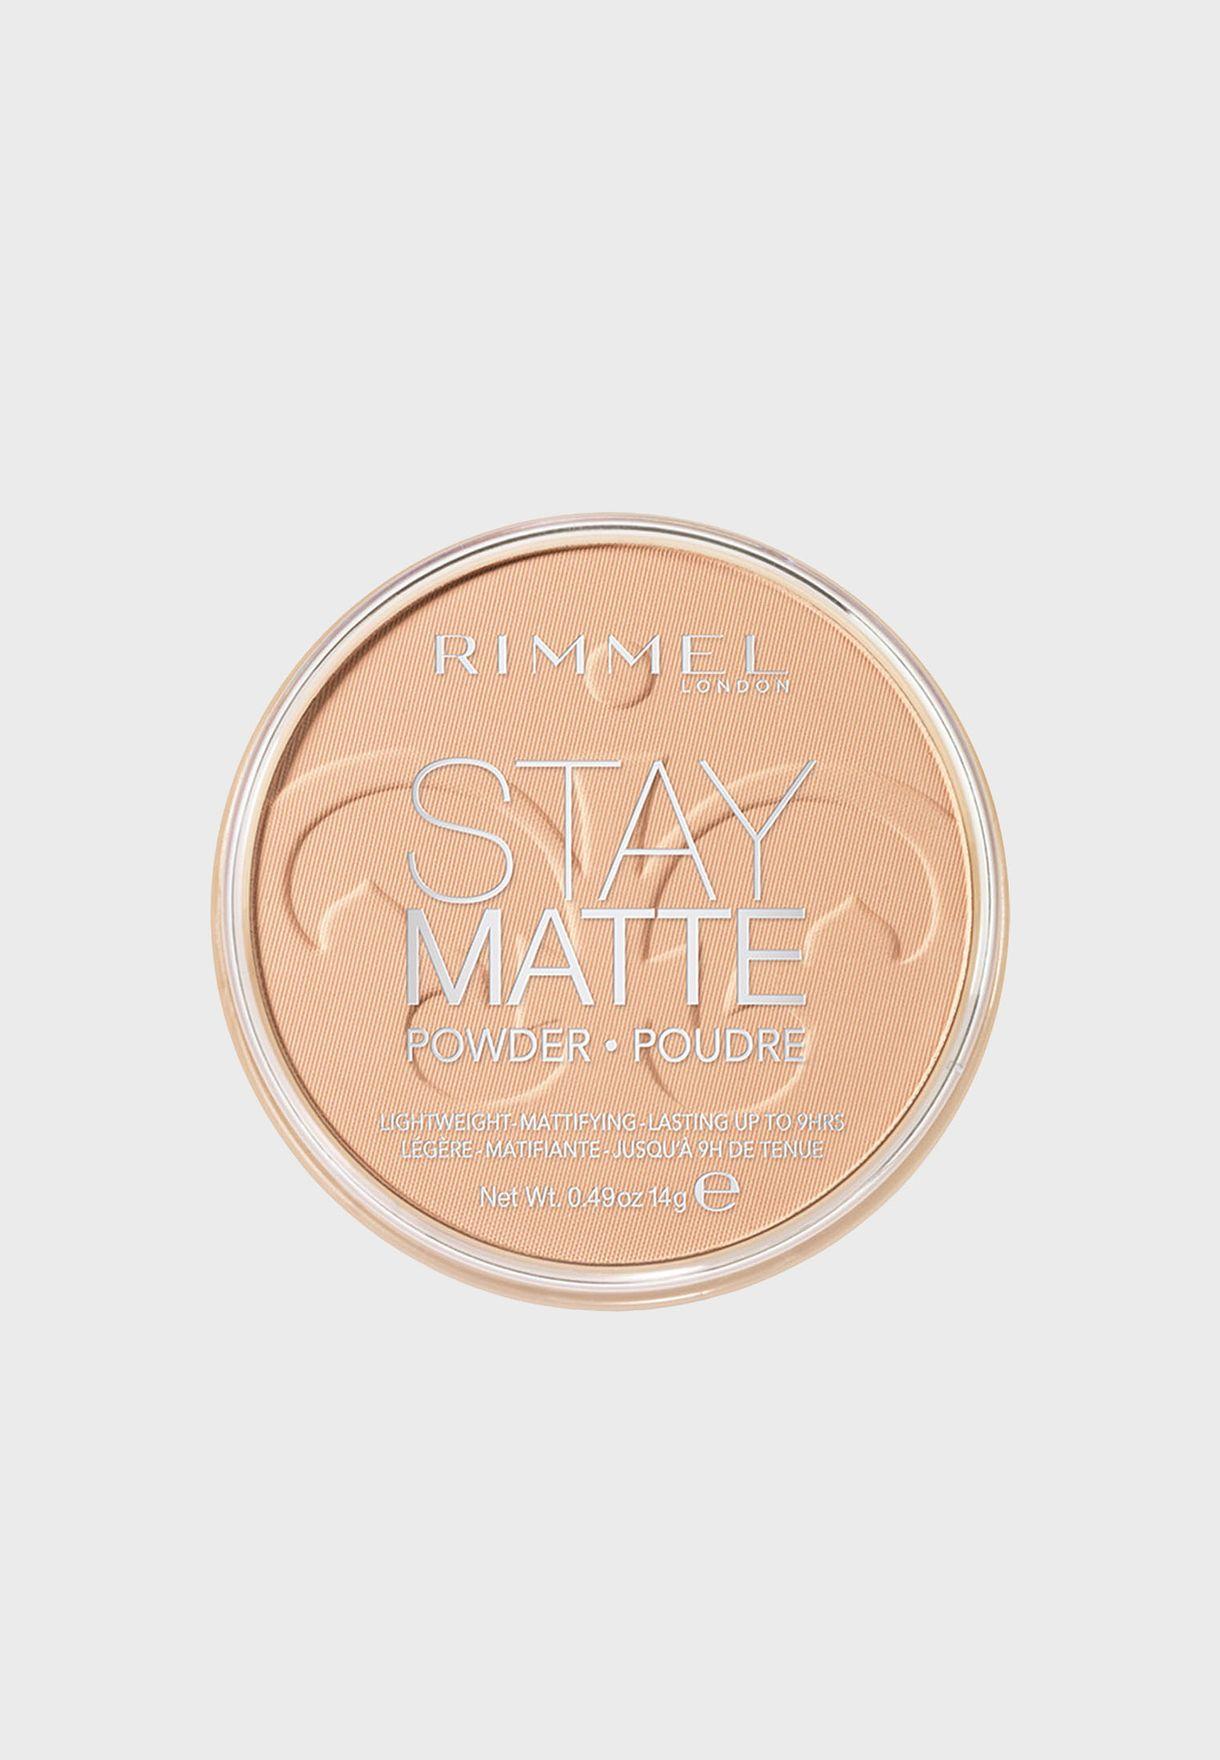 Shop Rimmel London Neutrals Stay Matte Pressed Powder 004 Sandstorm